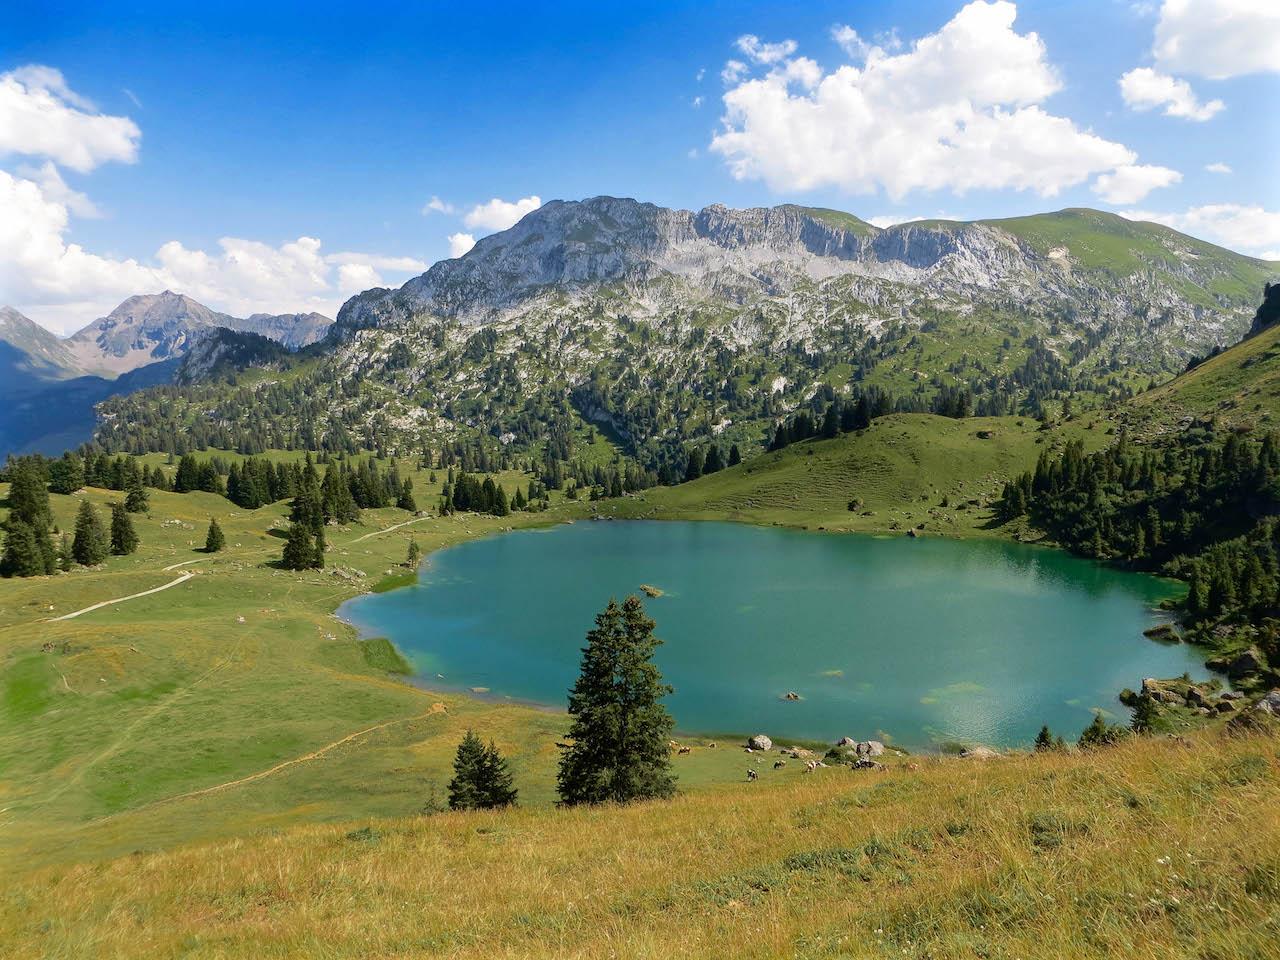 Bergseen in der Schweiz - Hier der Seebergsee im Berner Oberland.